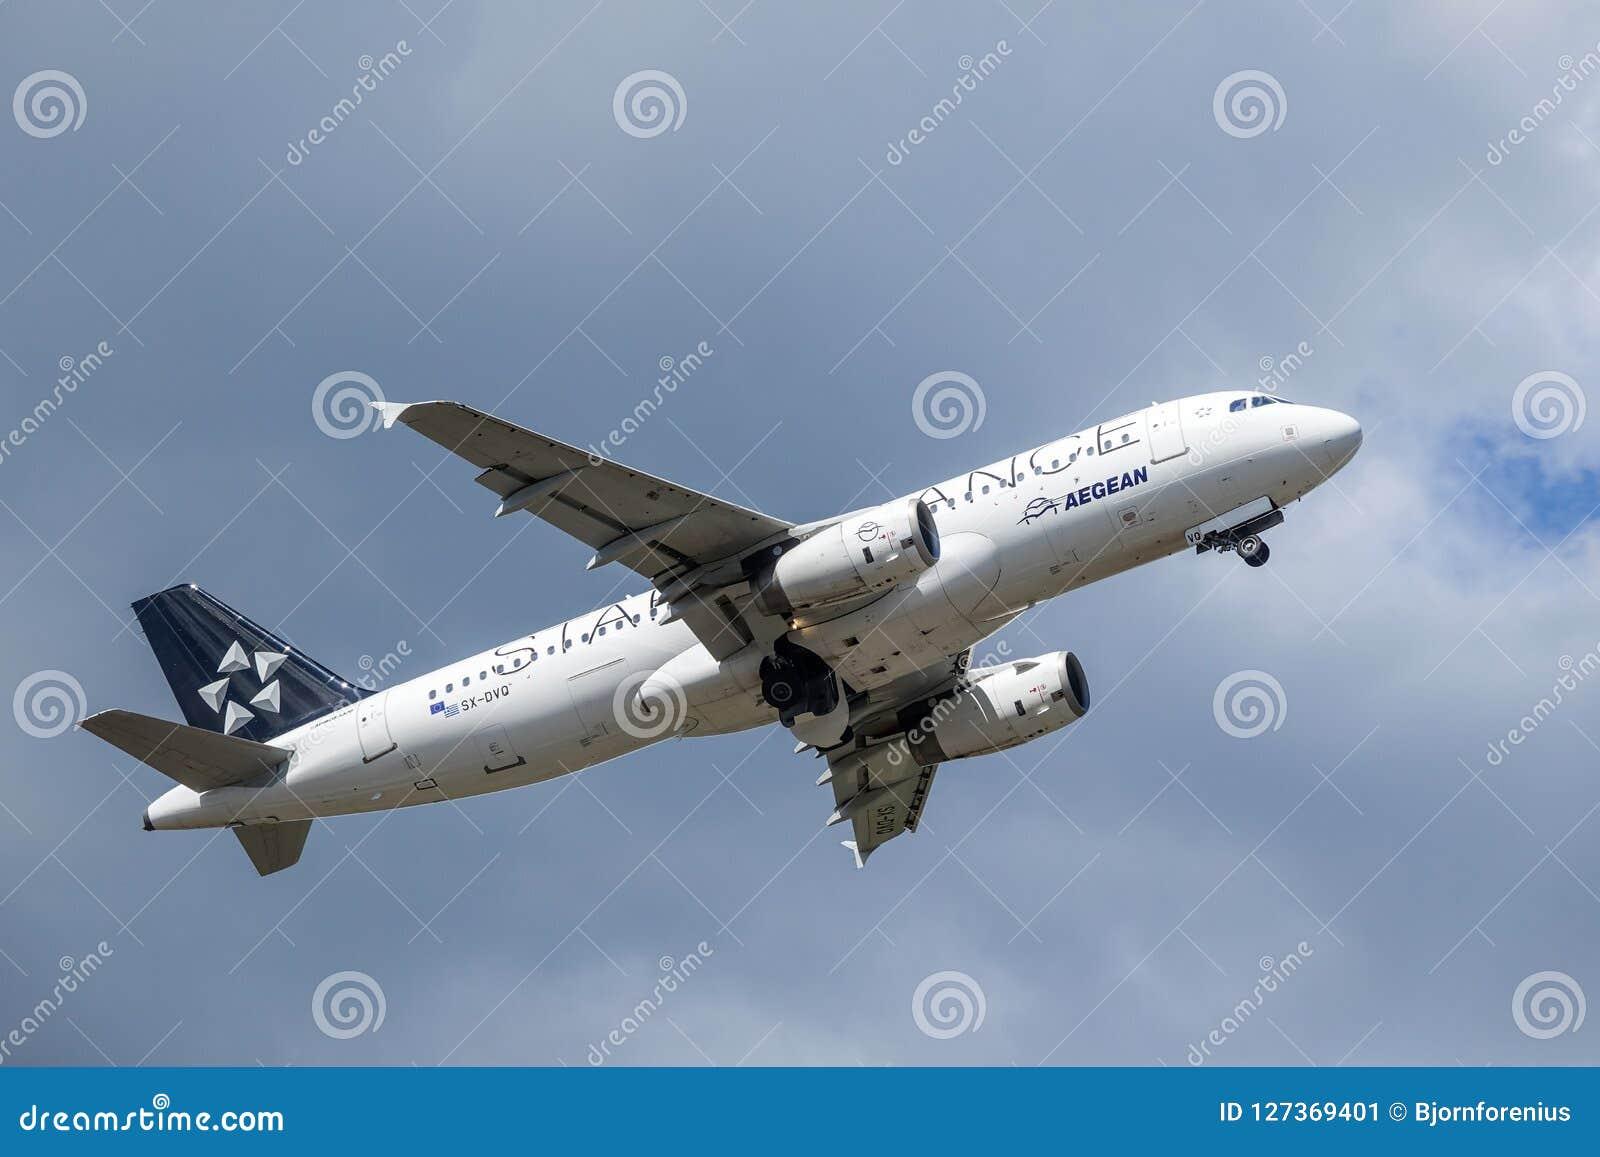 Aegean Airlines, Star Alliance, Airbus A320 - 200 decollano